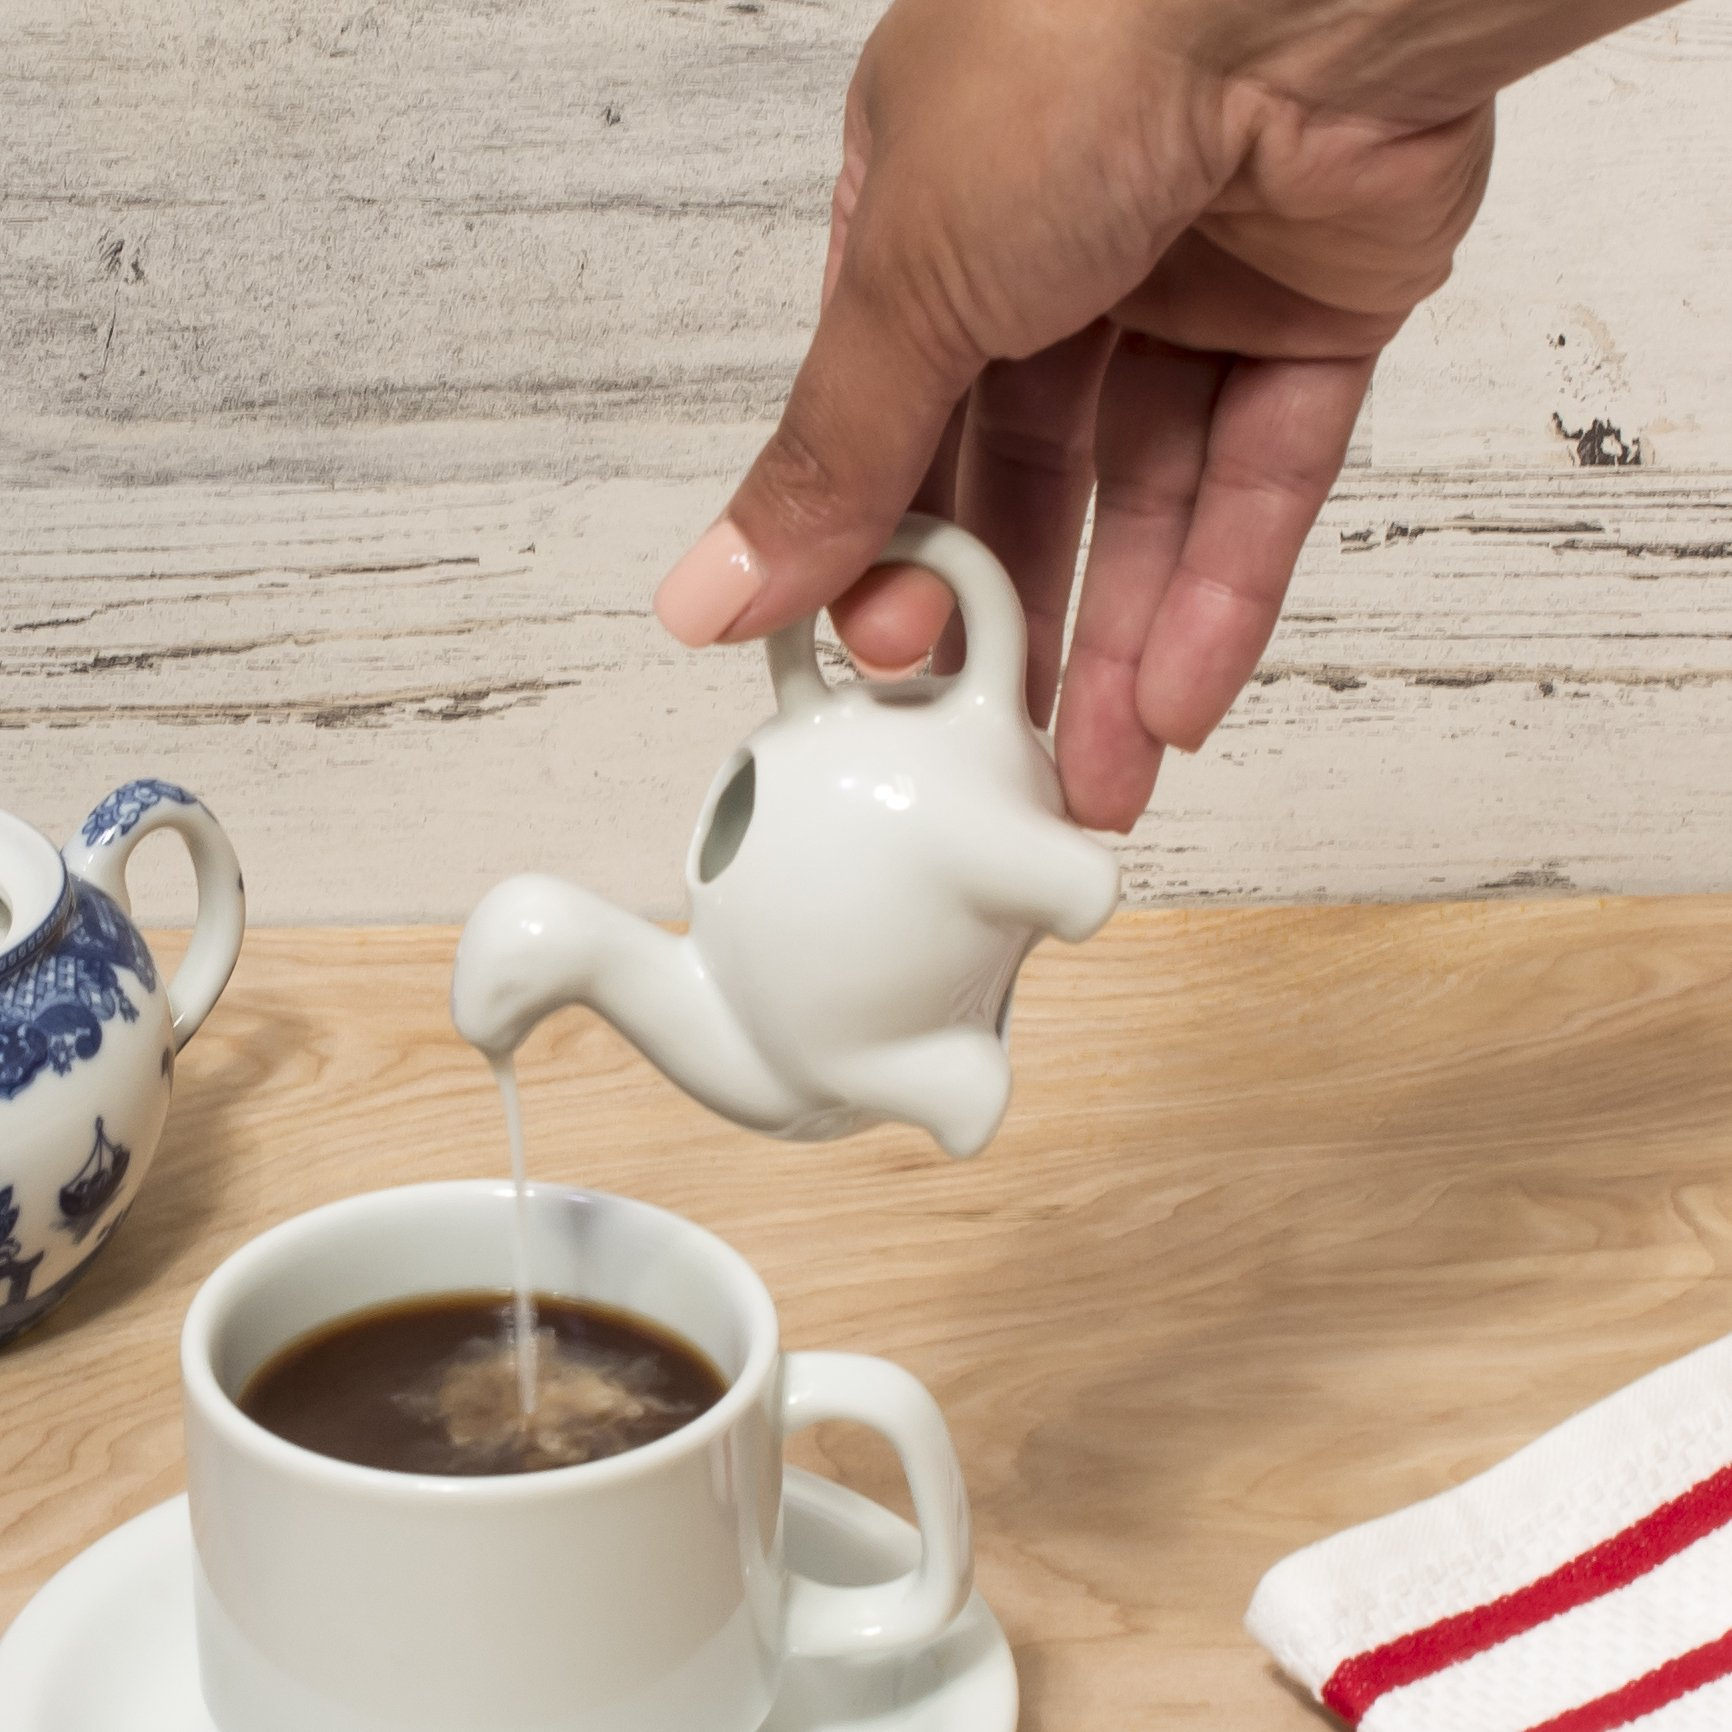 HIC Harold Import Co. Kitchen Mini Dinosaur Creamer with Handle, Fine White Porcelain, 2-Ounce